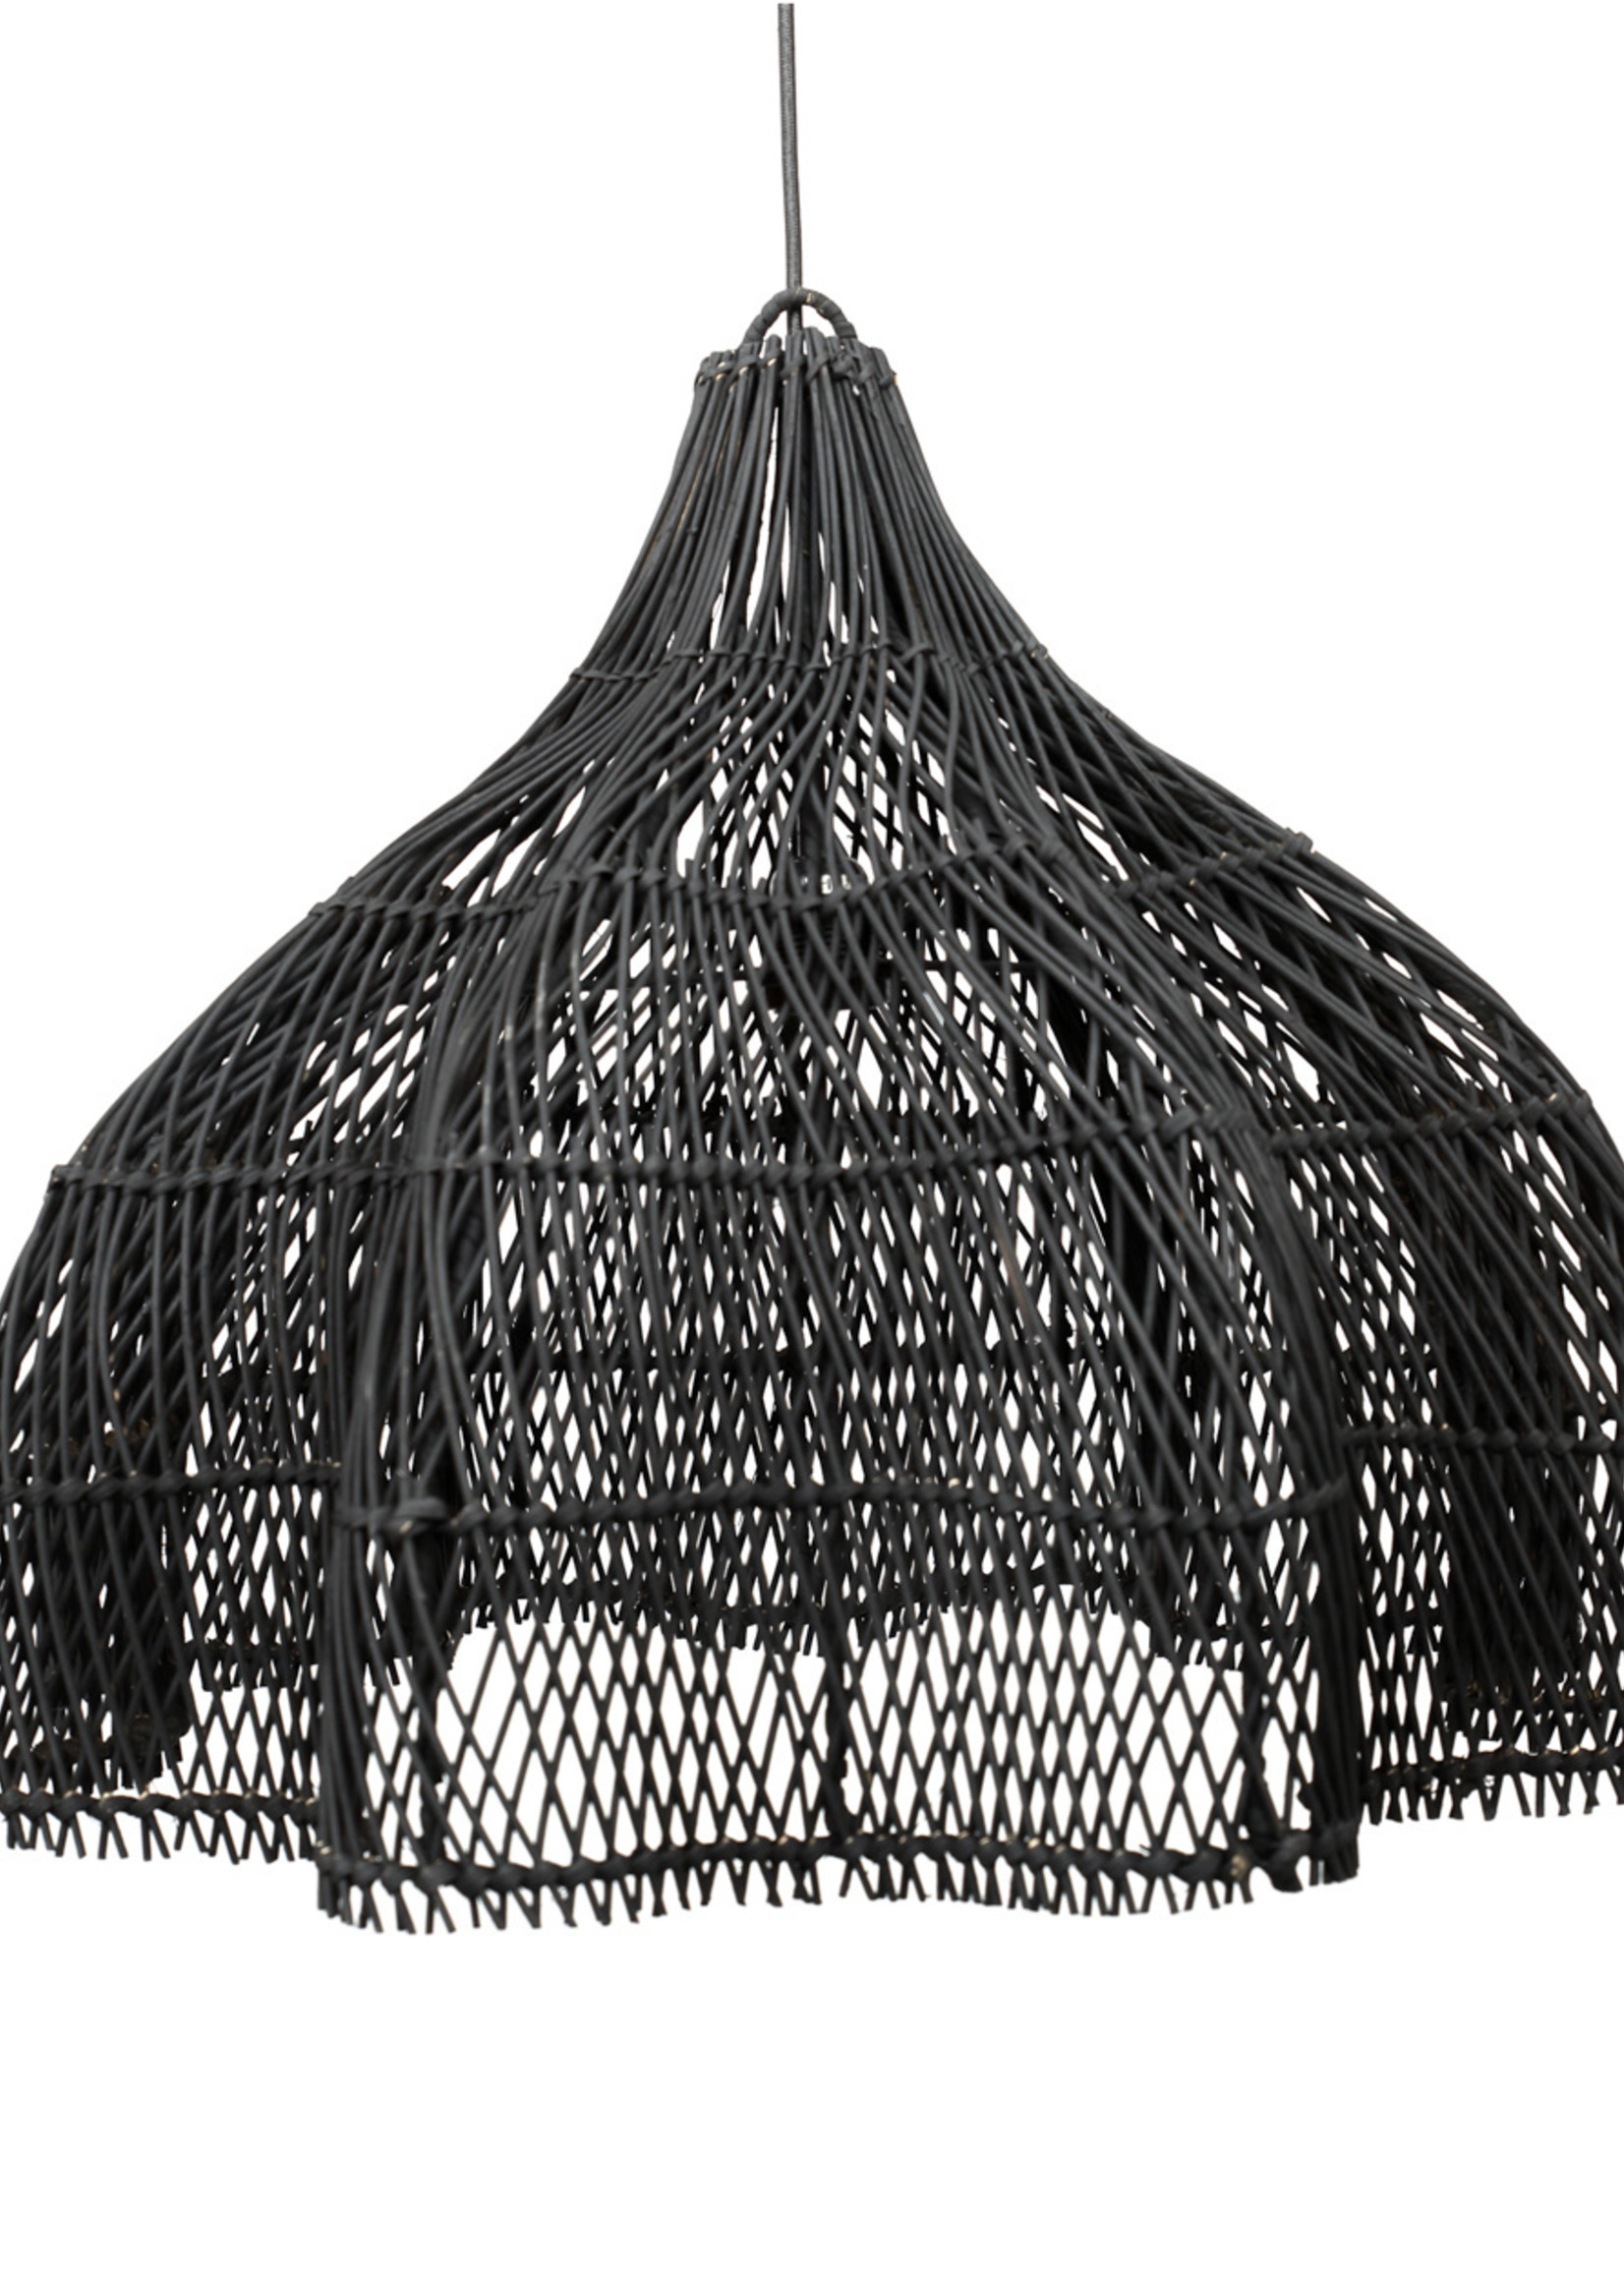 The Whipped Pendant - Black - Medium